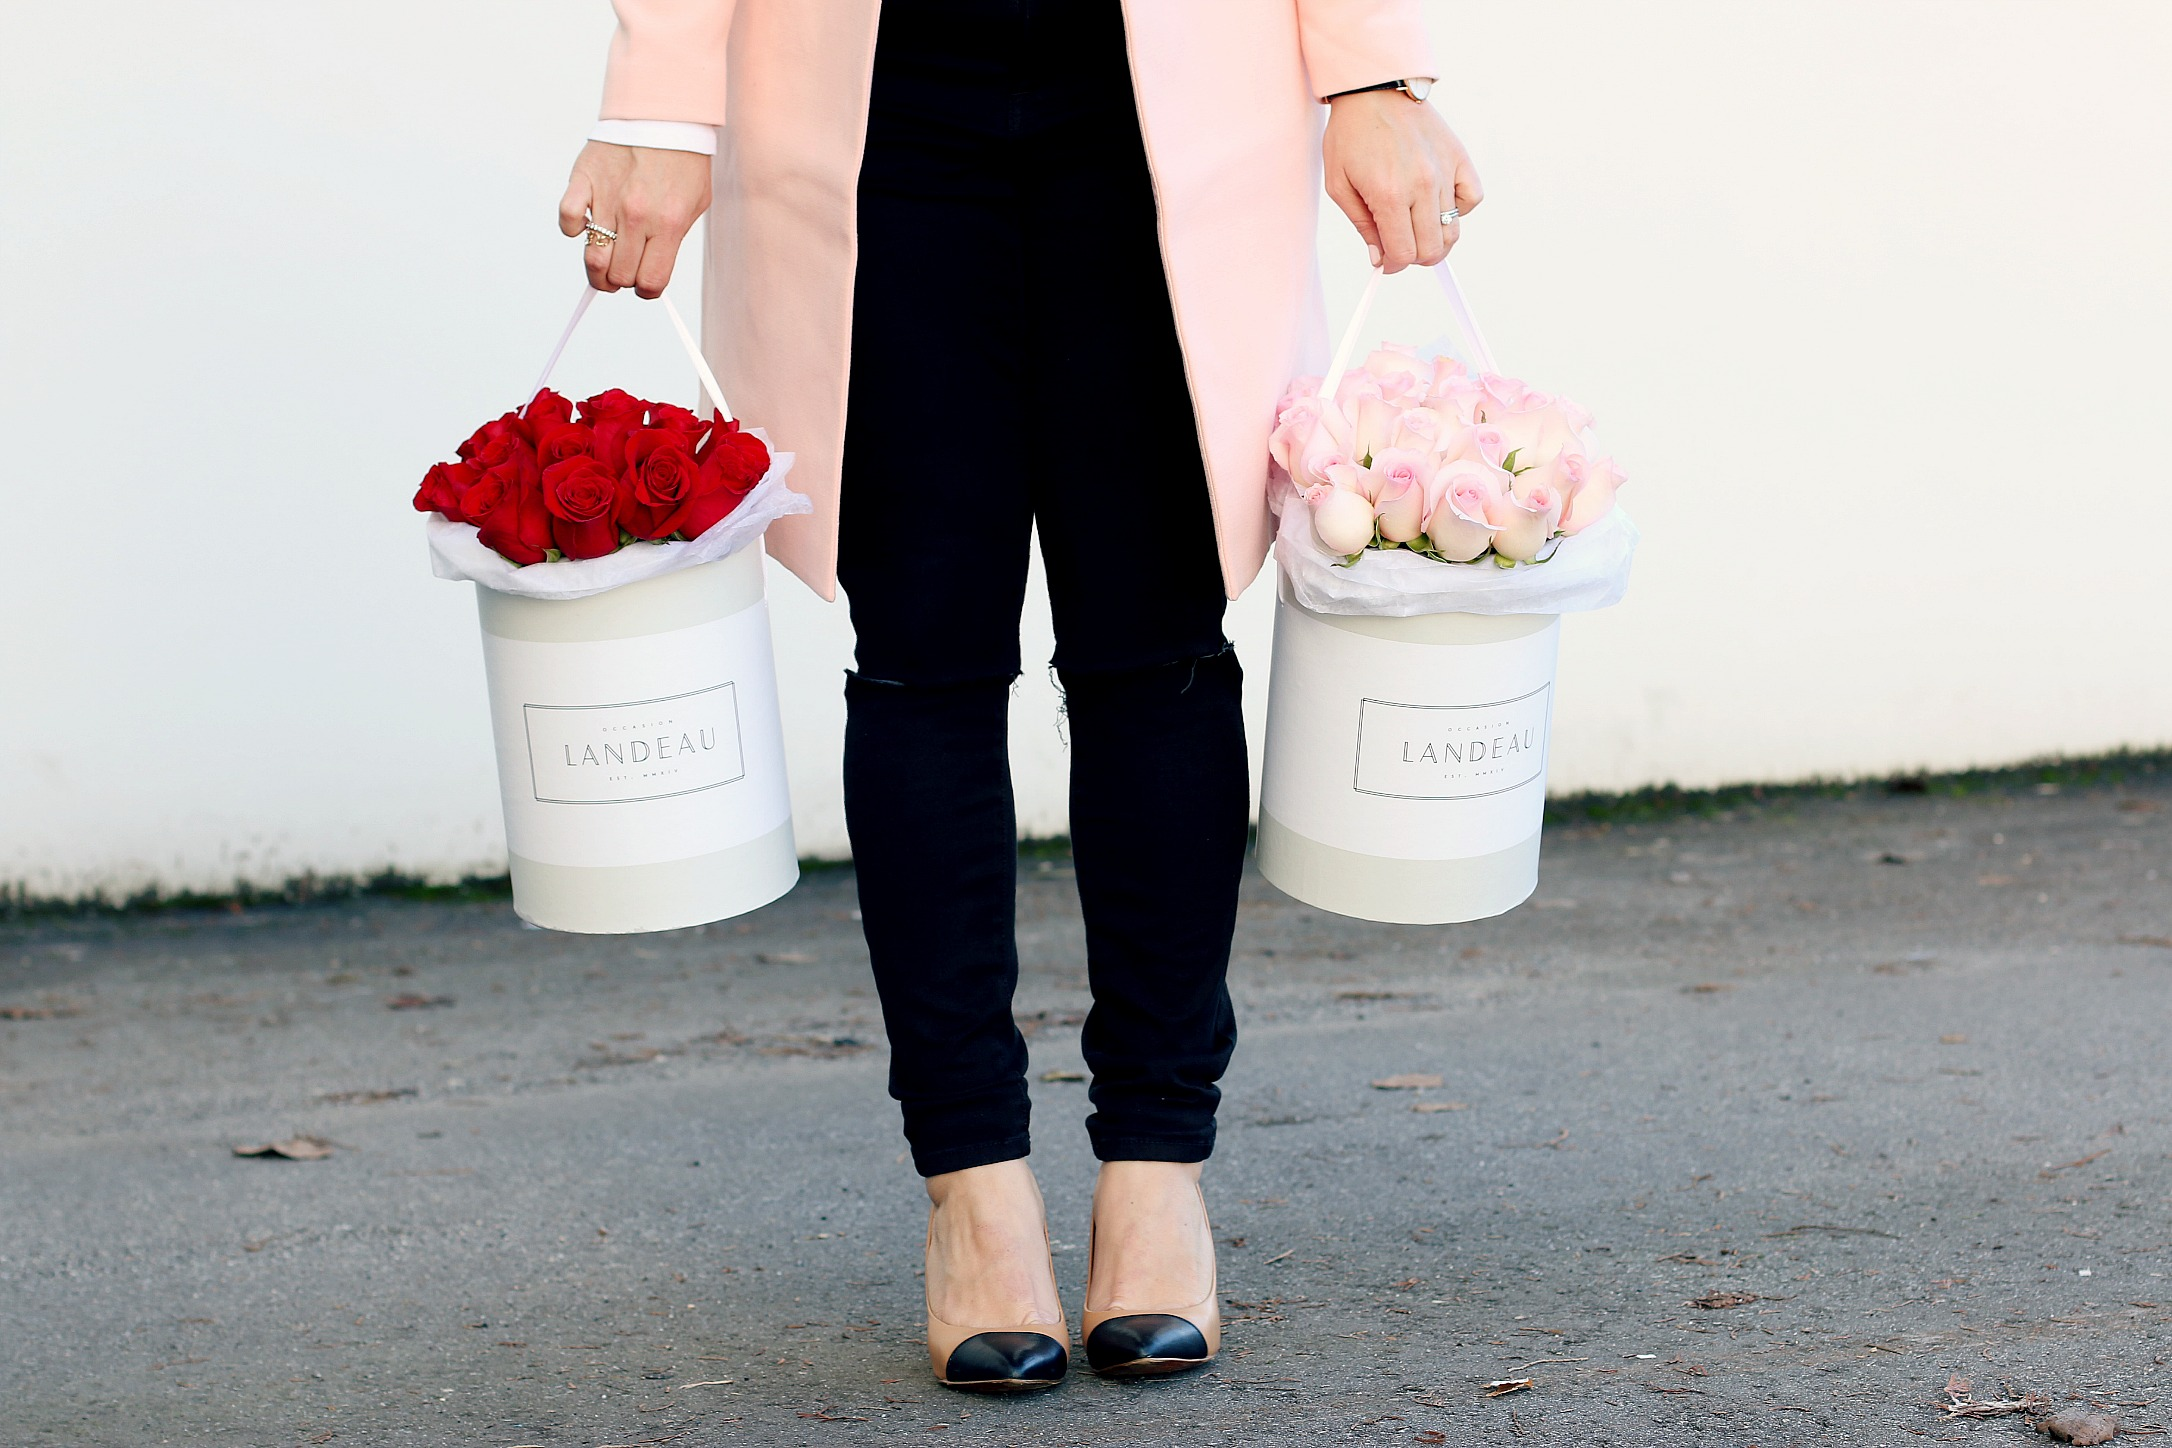 Valentines Day Give Landeau Roses Monika HIbbs